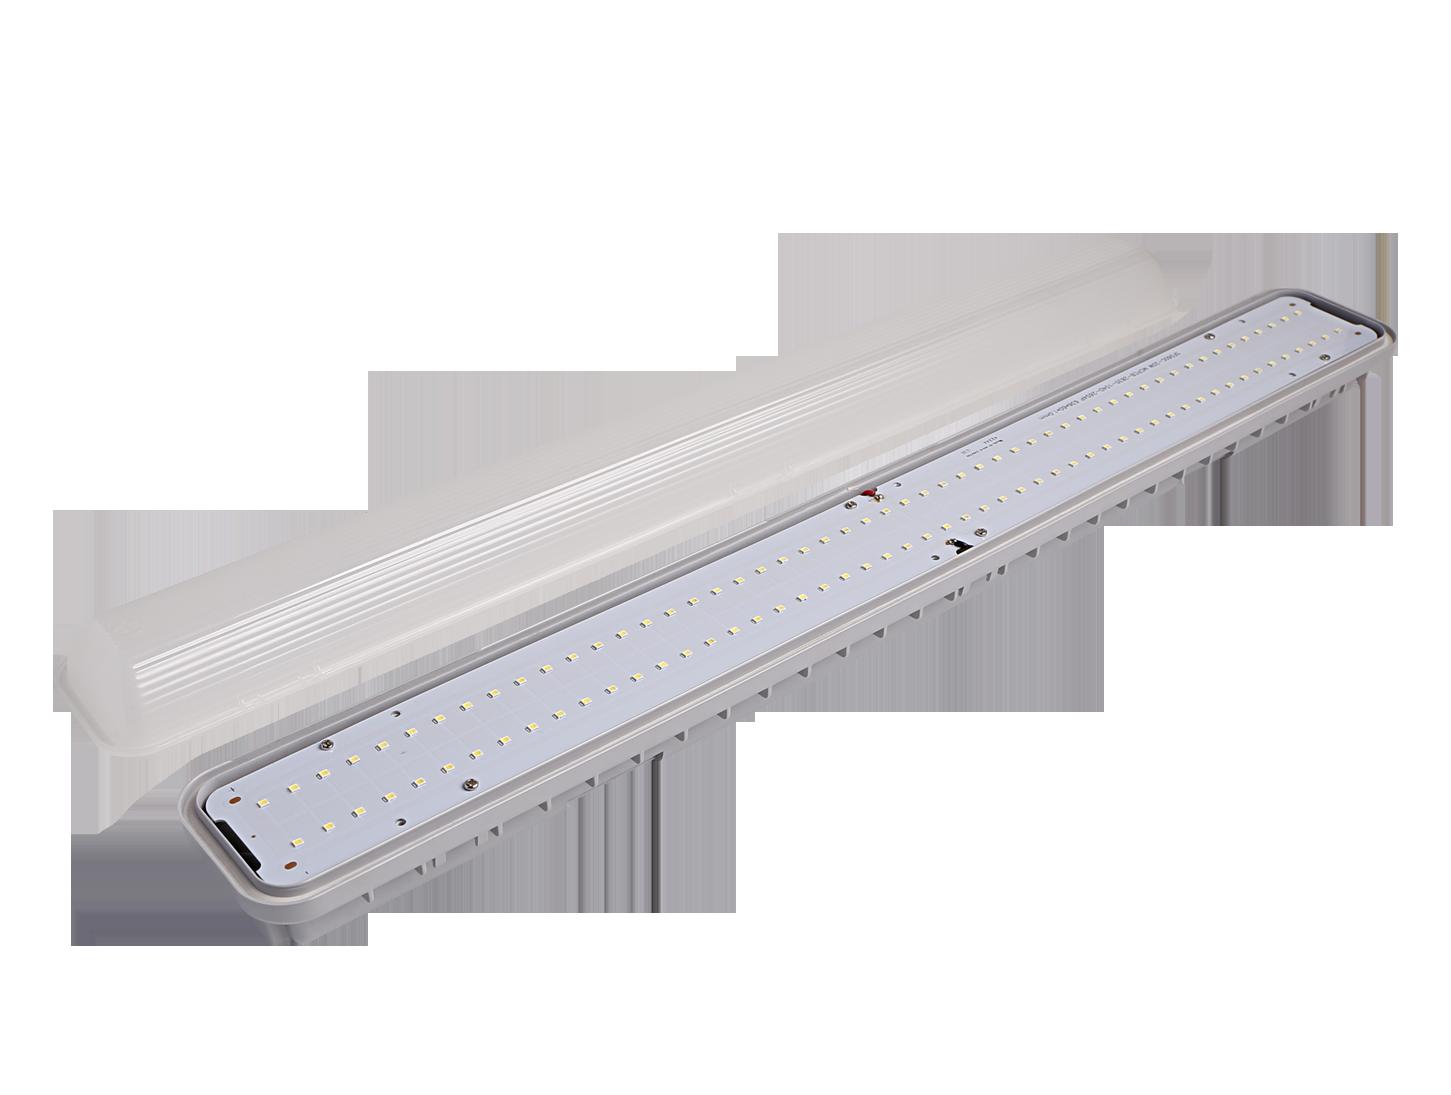 SMD2835 Tri-proof LED Tube Lights 20W 40W 46W LED Lamps Bulbs White